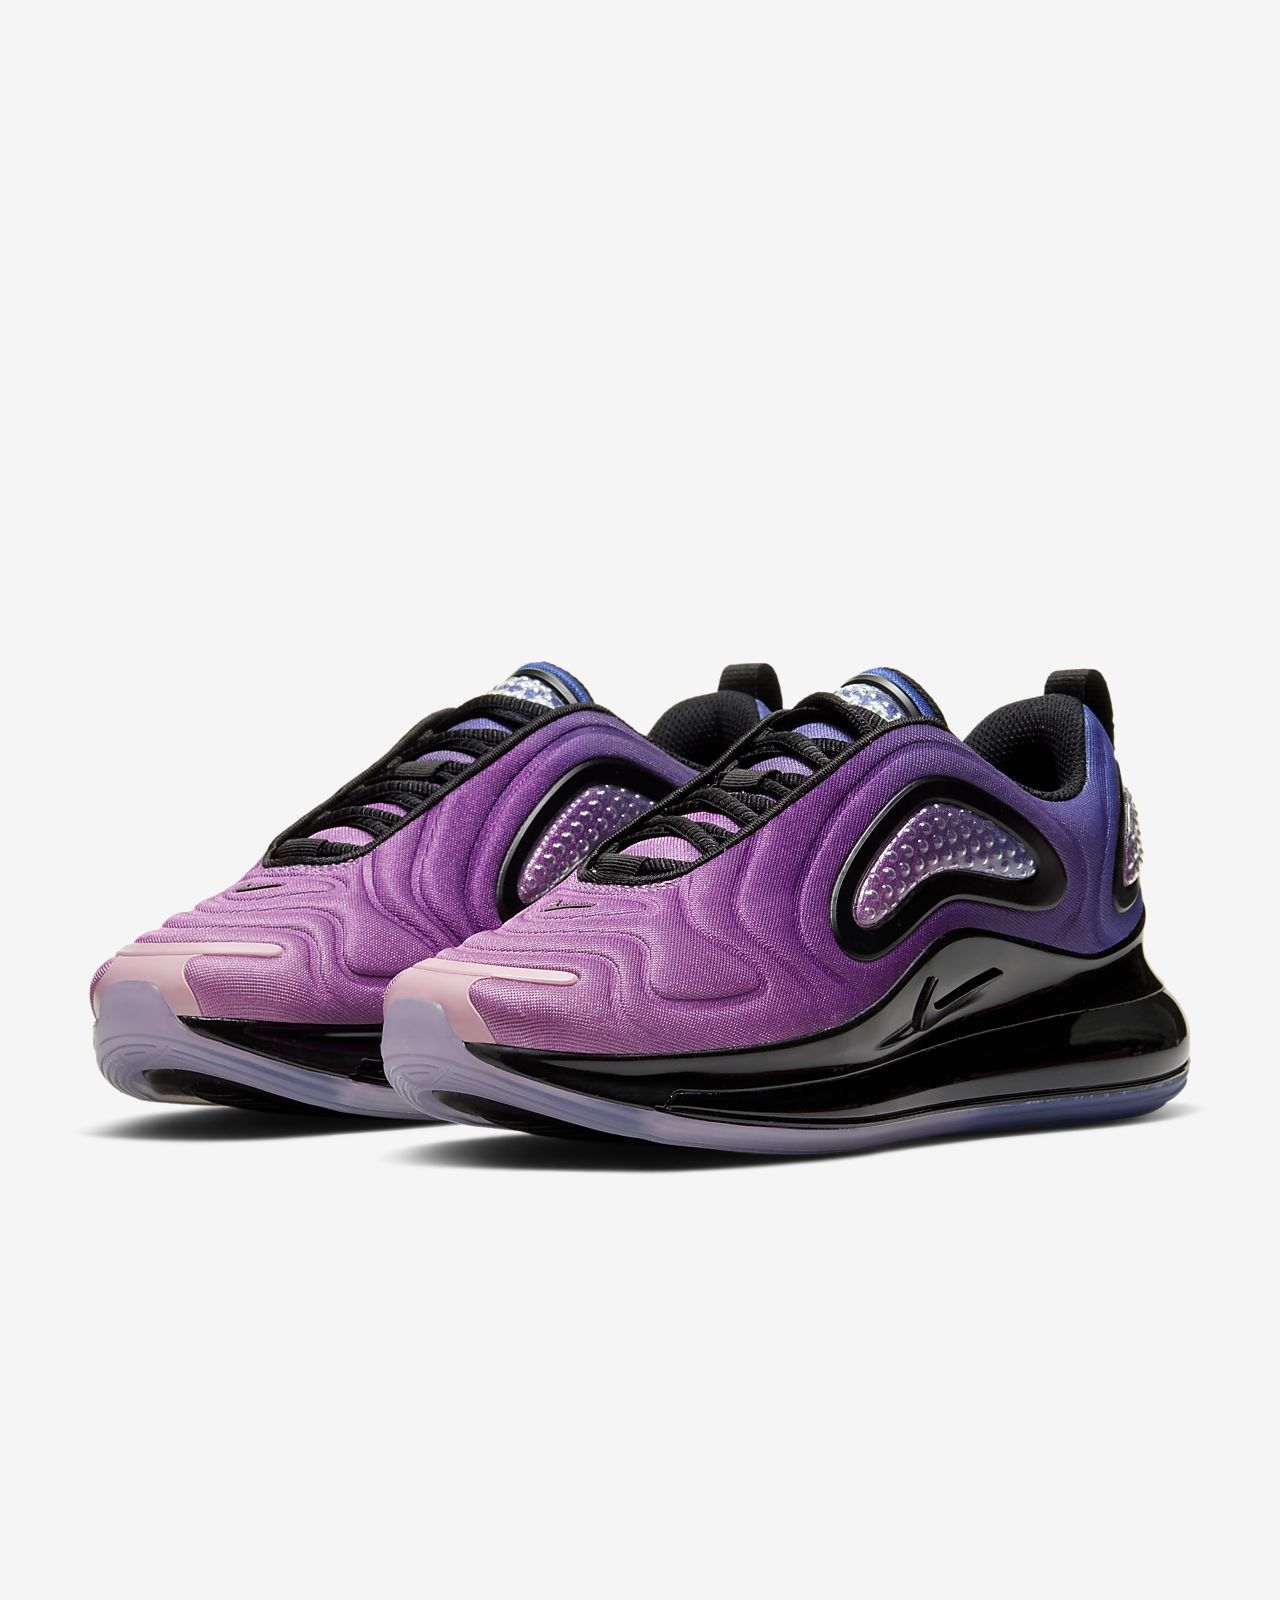 Zapatillas nike air max 720 pink sea